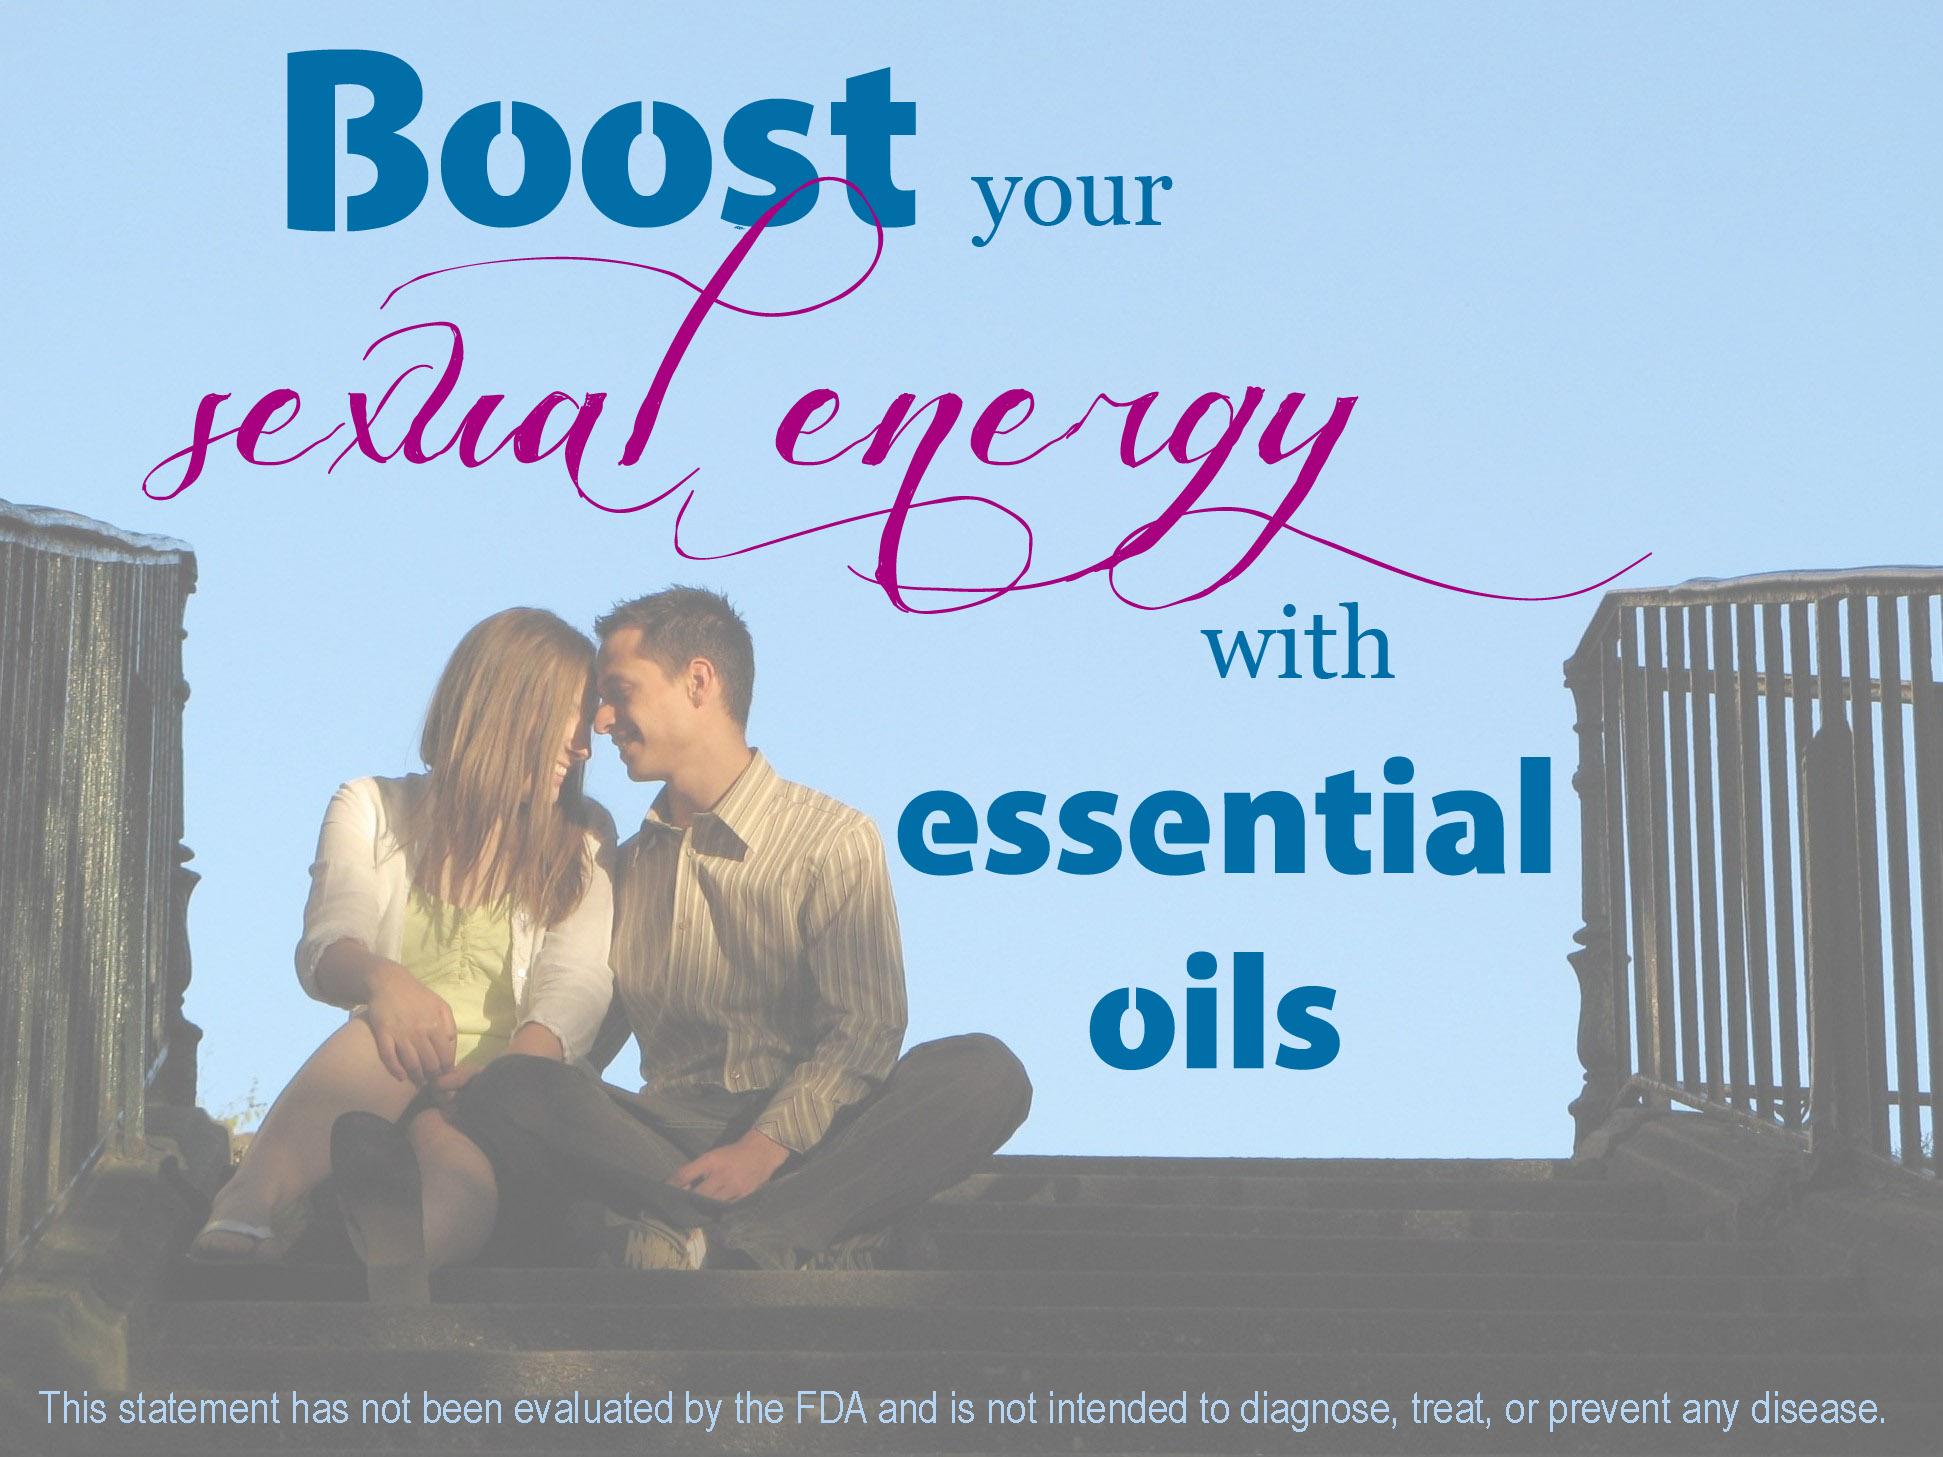 Sexual Energy Essential Oil Blend - 2.0 fl oz (60 ml)